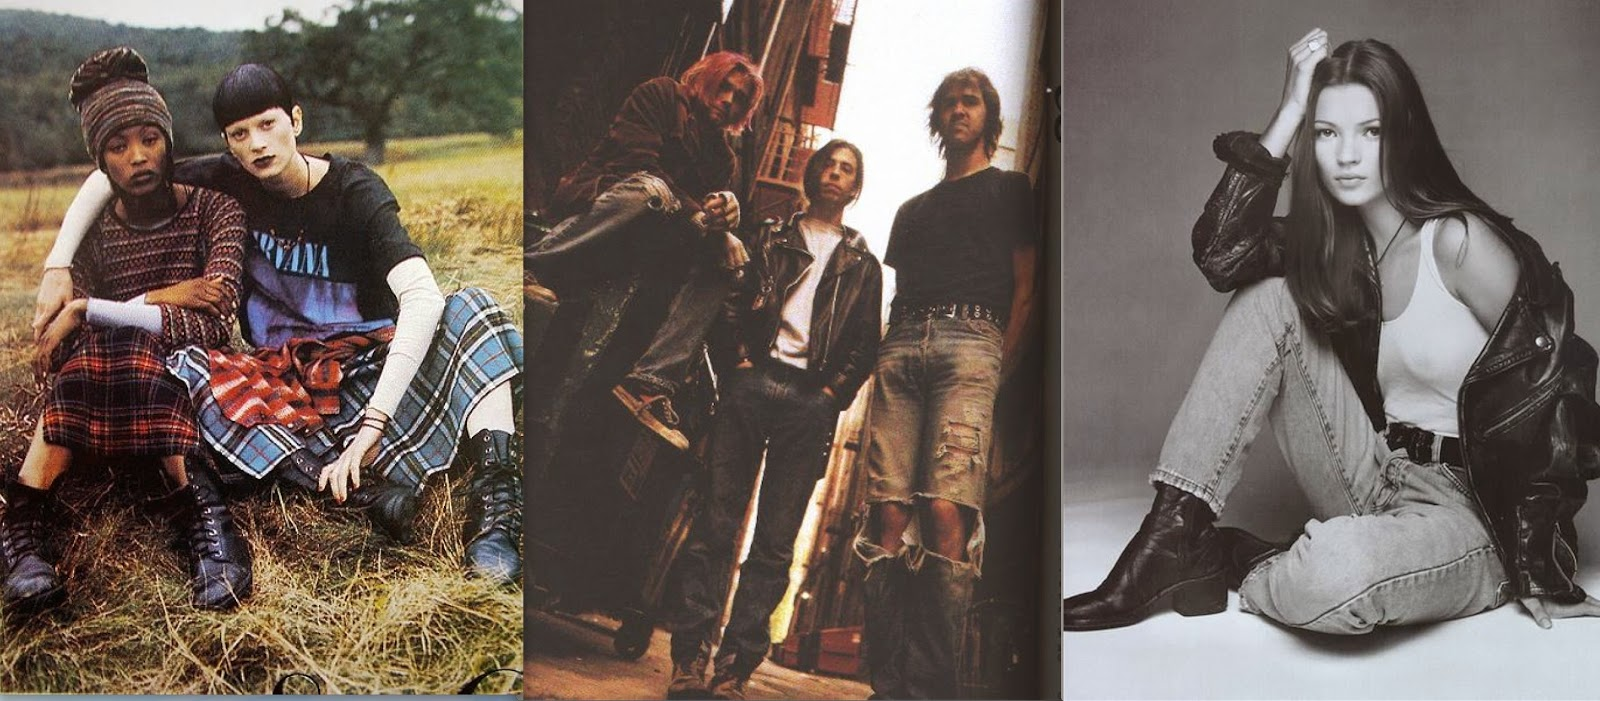 Grunge bands